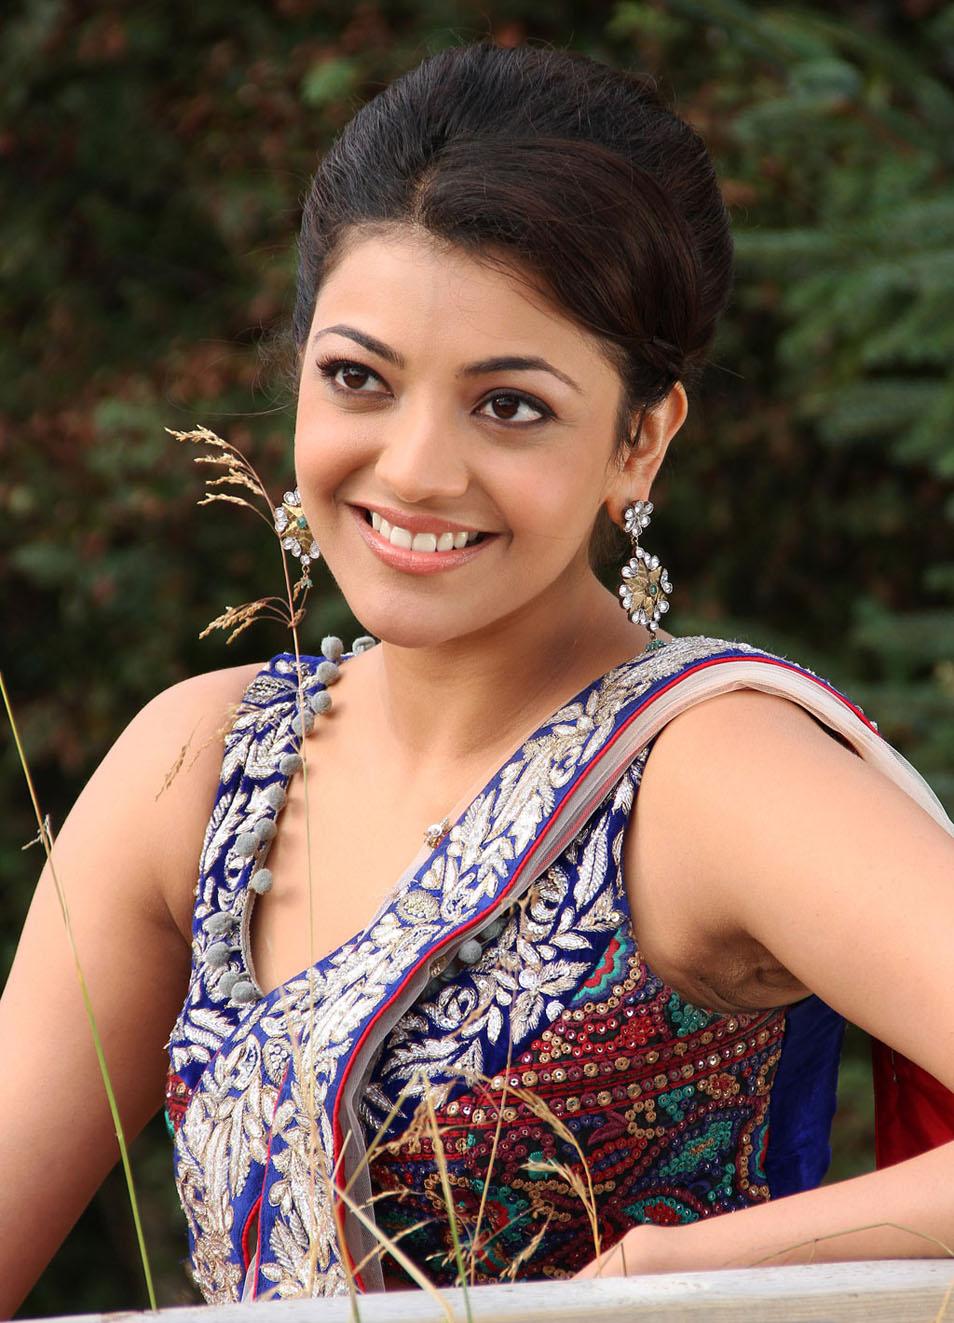 Kajal Agarwal Live Wallpaper - Tamil Actress Kajal Agarwal , HD Wallpaper & Backgrounds